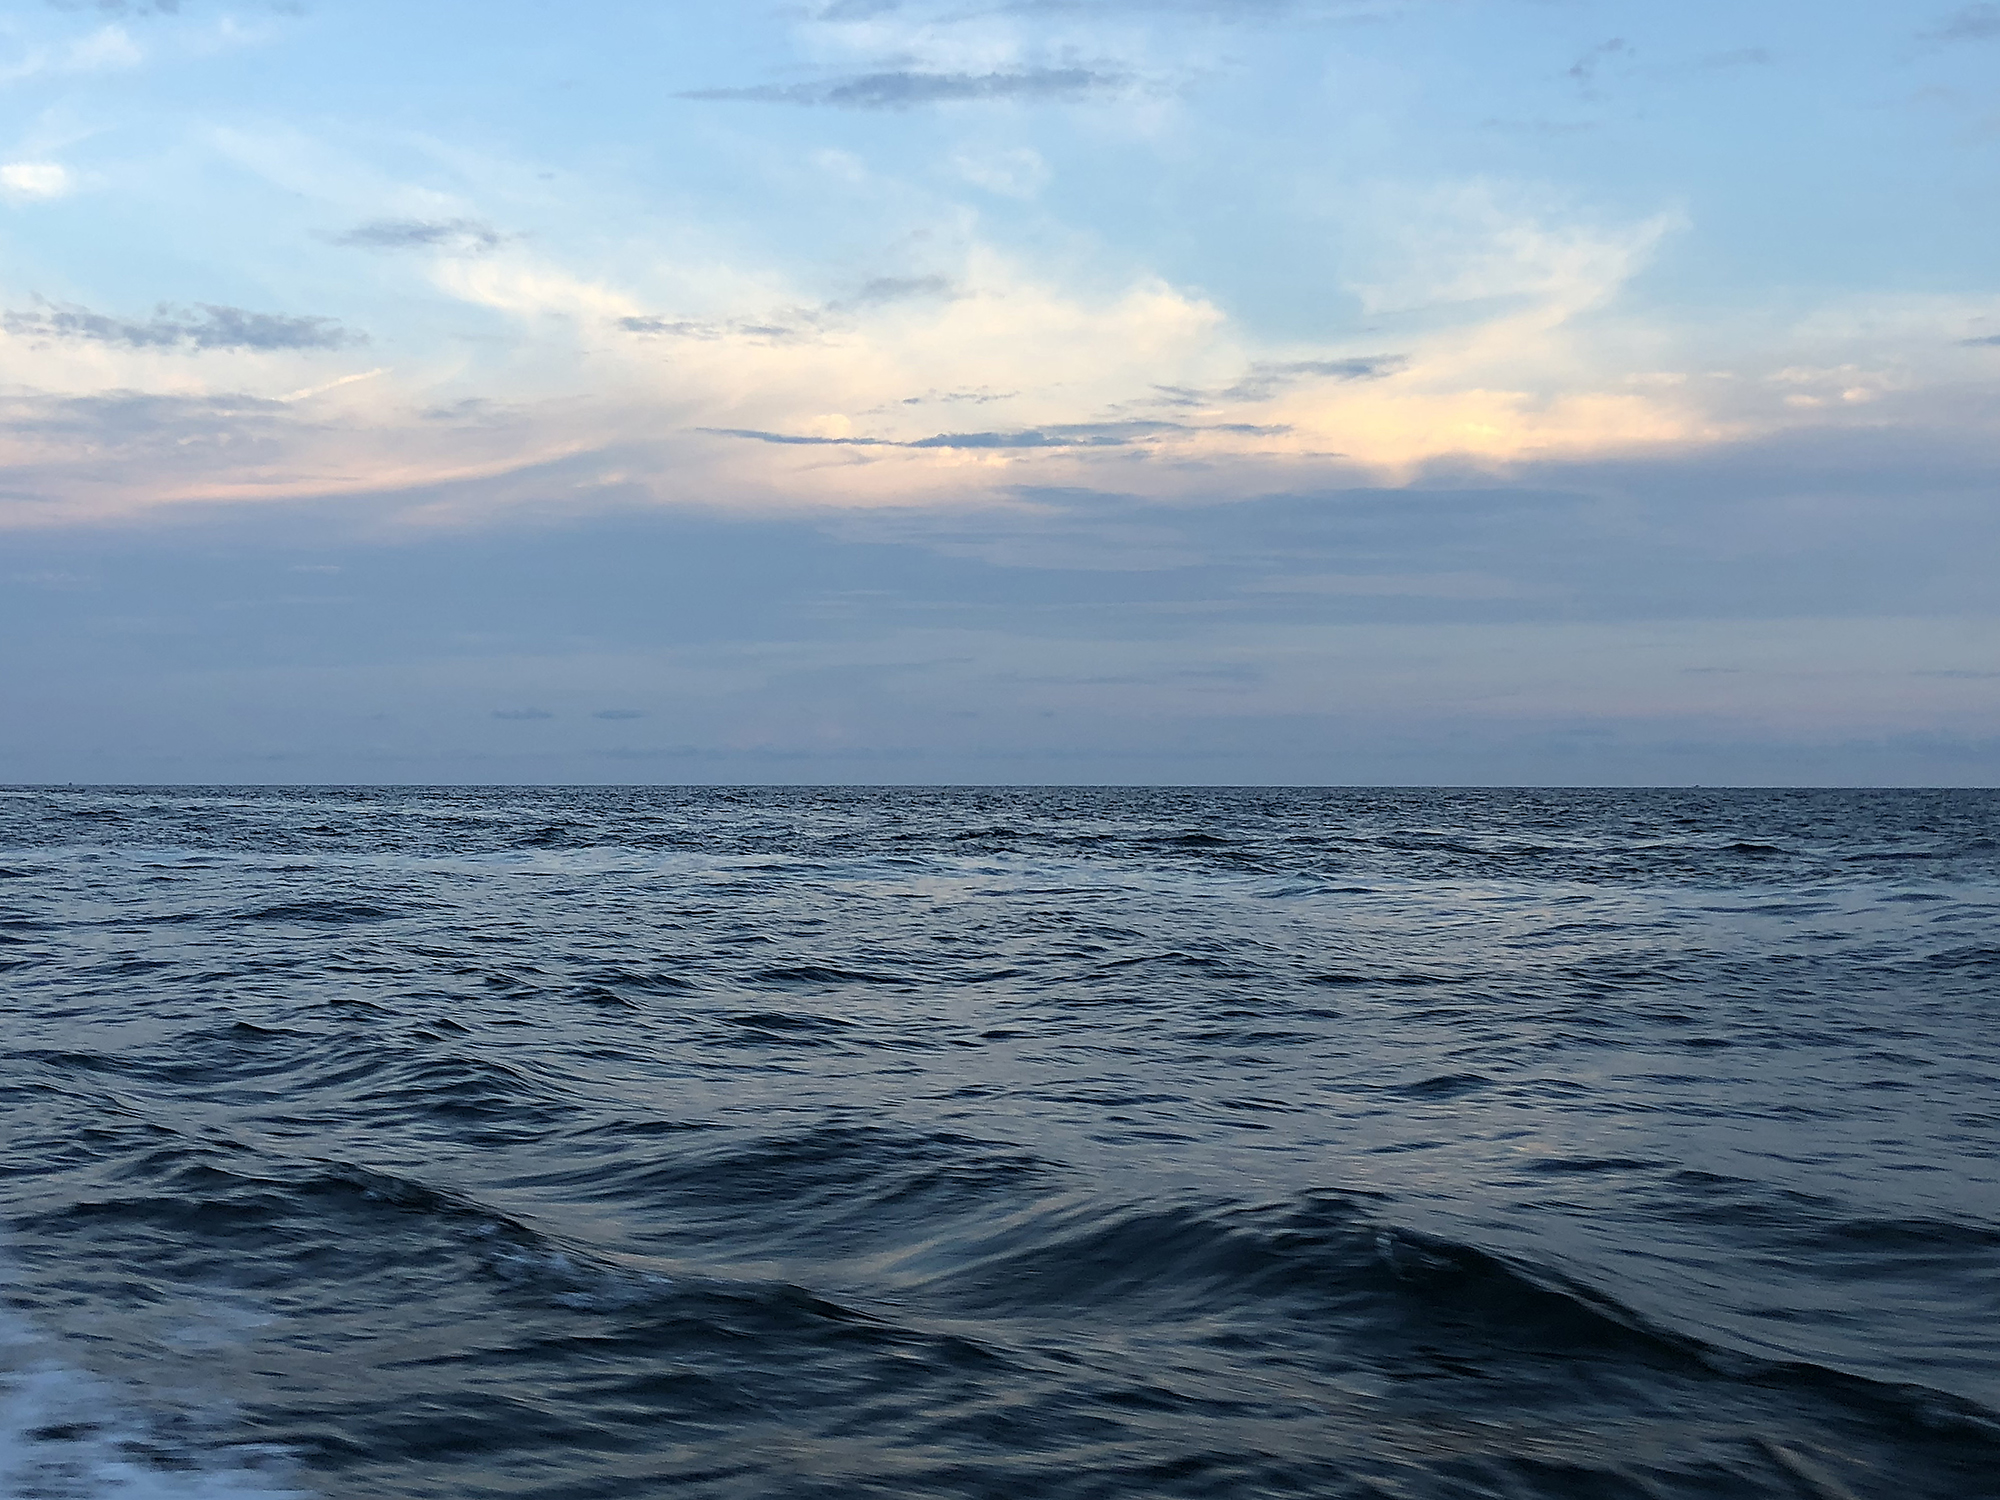 Tiffany Shae, Tiffany Shae Photography, 30A Beach Photographer, Rosemary Beach Photographer, Alys Beach, Destin Beach Photographer, Kingdom Builder, Jesus Follower, Christ, Holy Hustler, Photographer, Designer